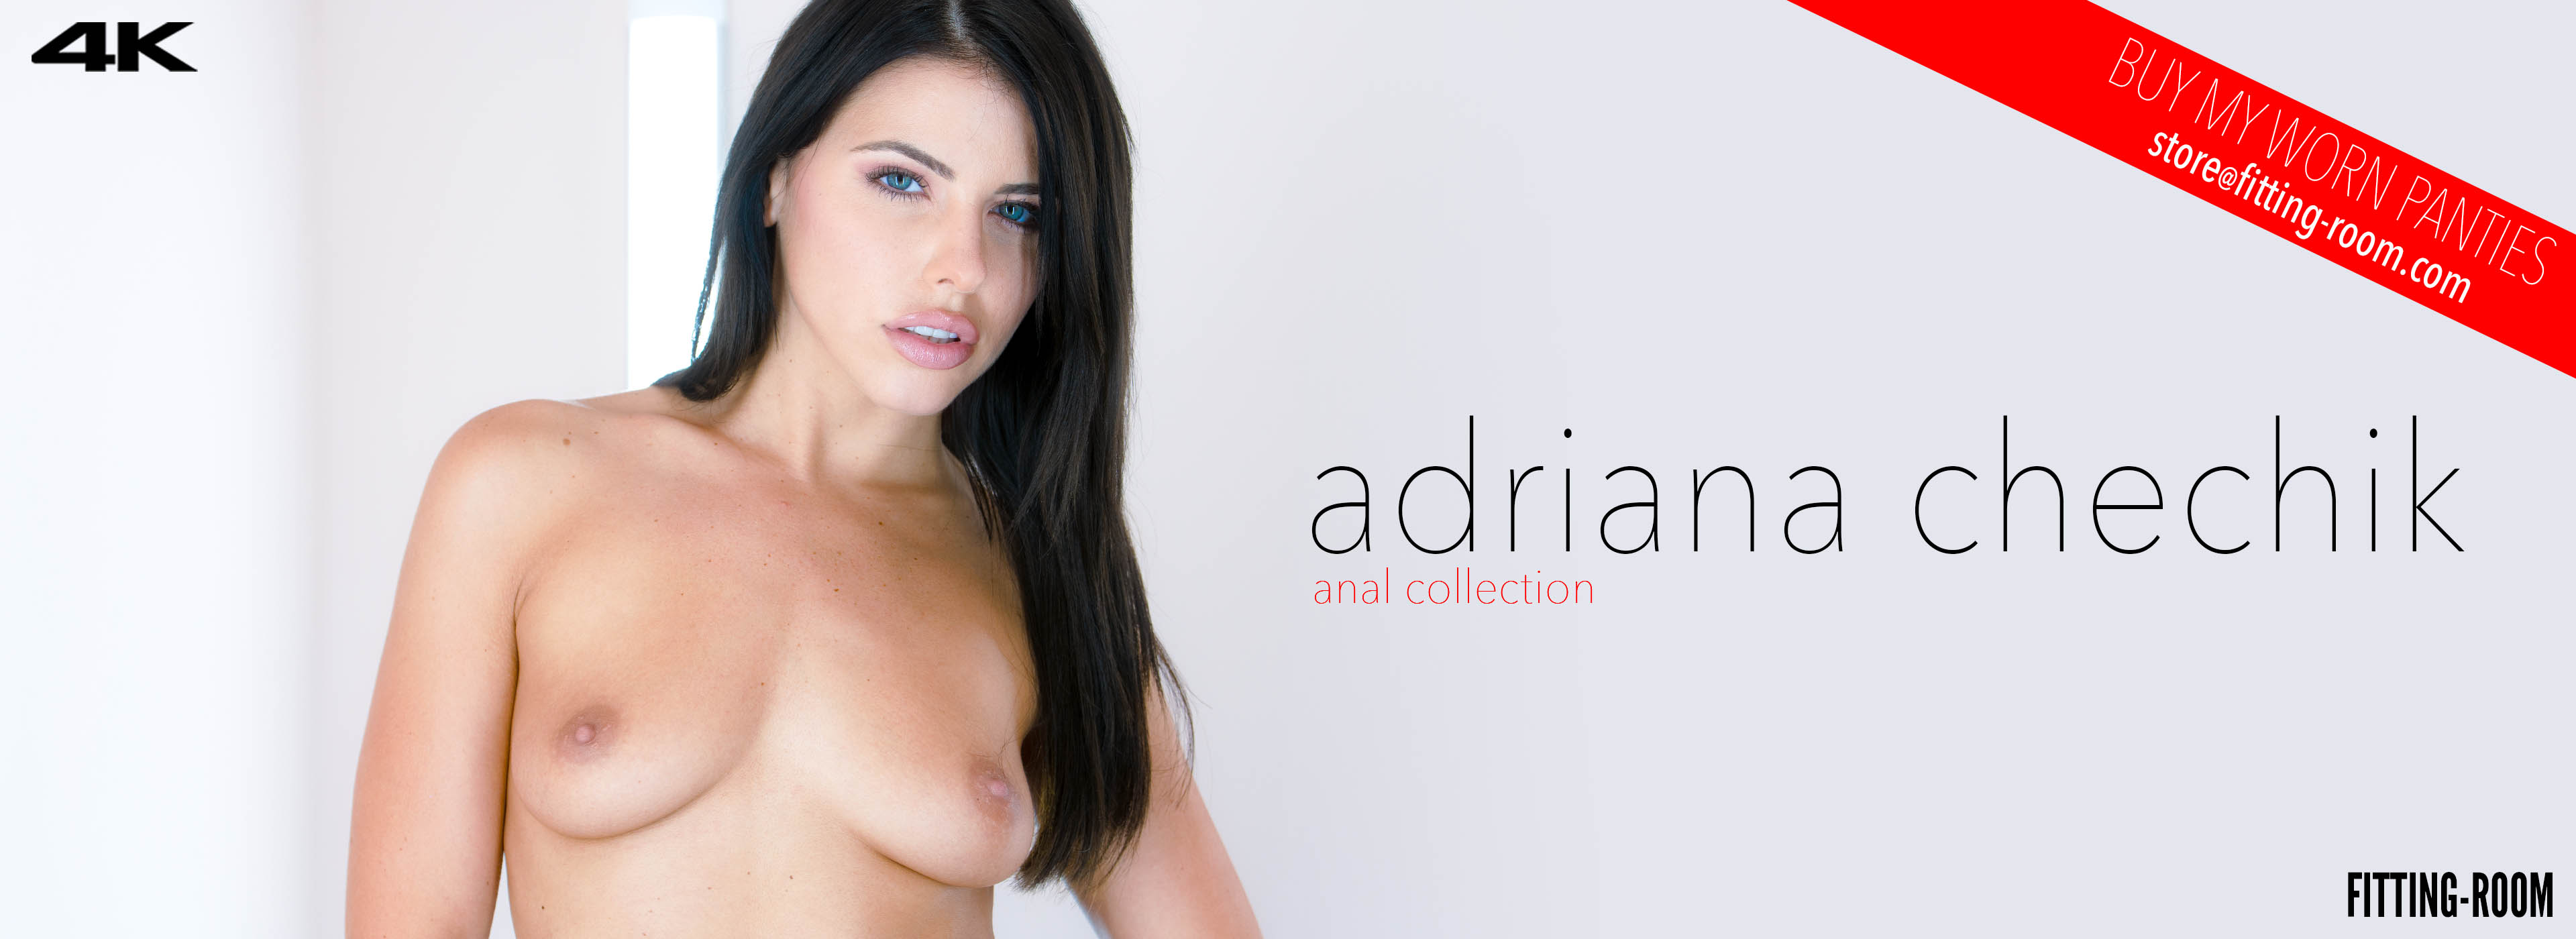 Adriana Chechik | Scrub My Butthole